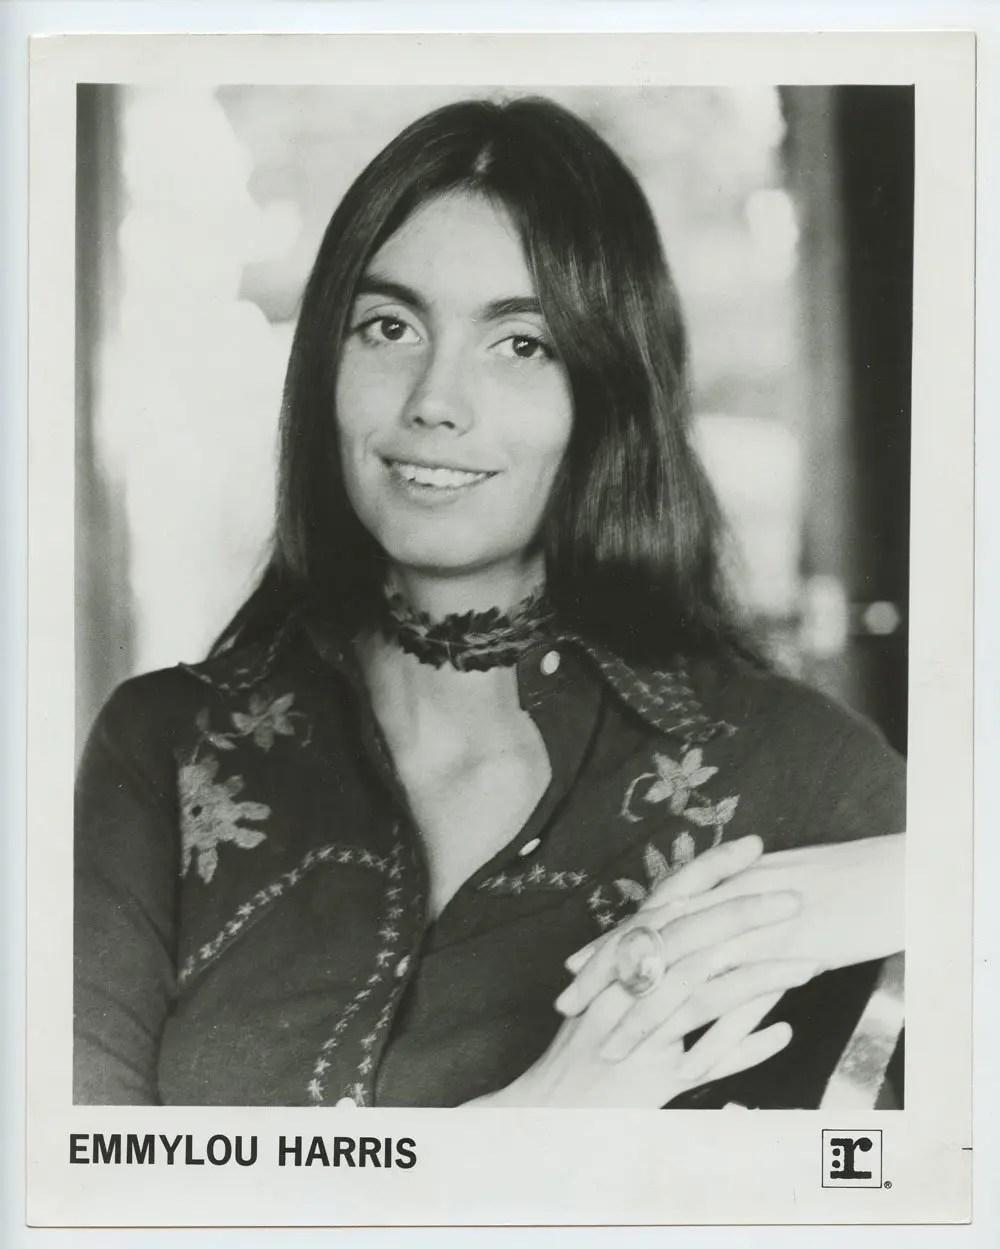 Emmylou Harris Photo 1975 Reprise Records Original Vintage